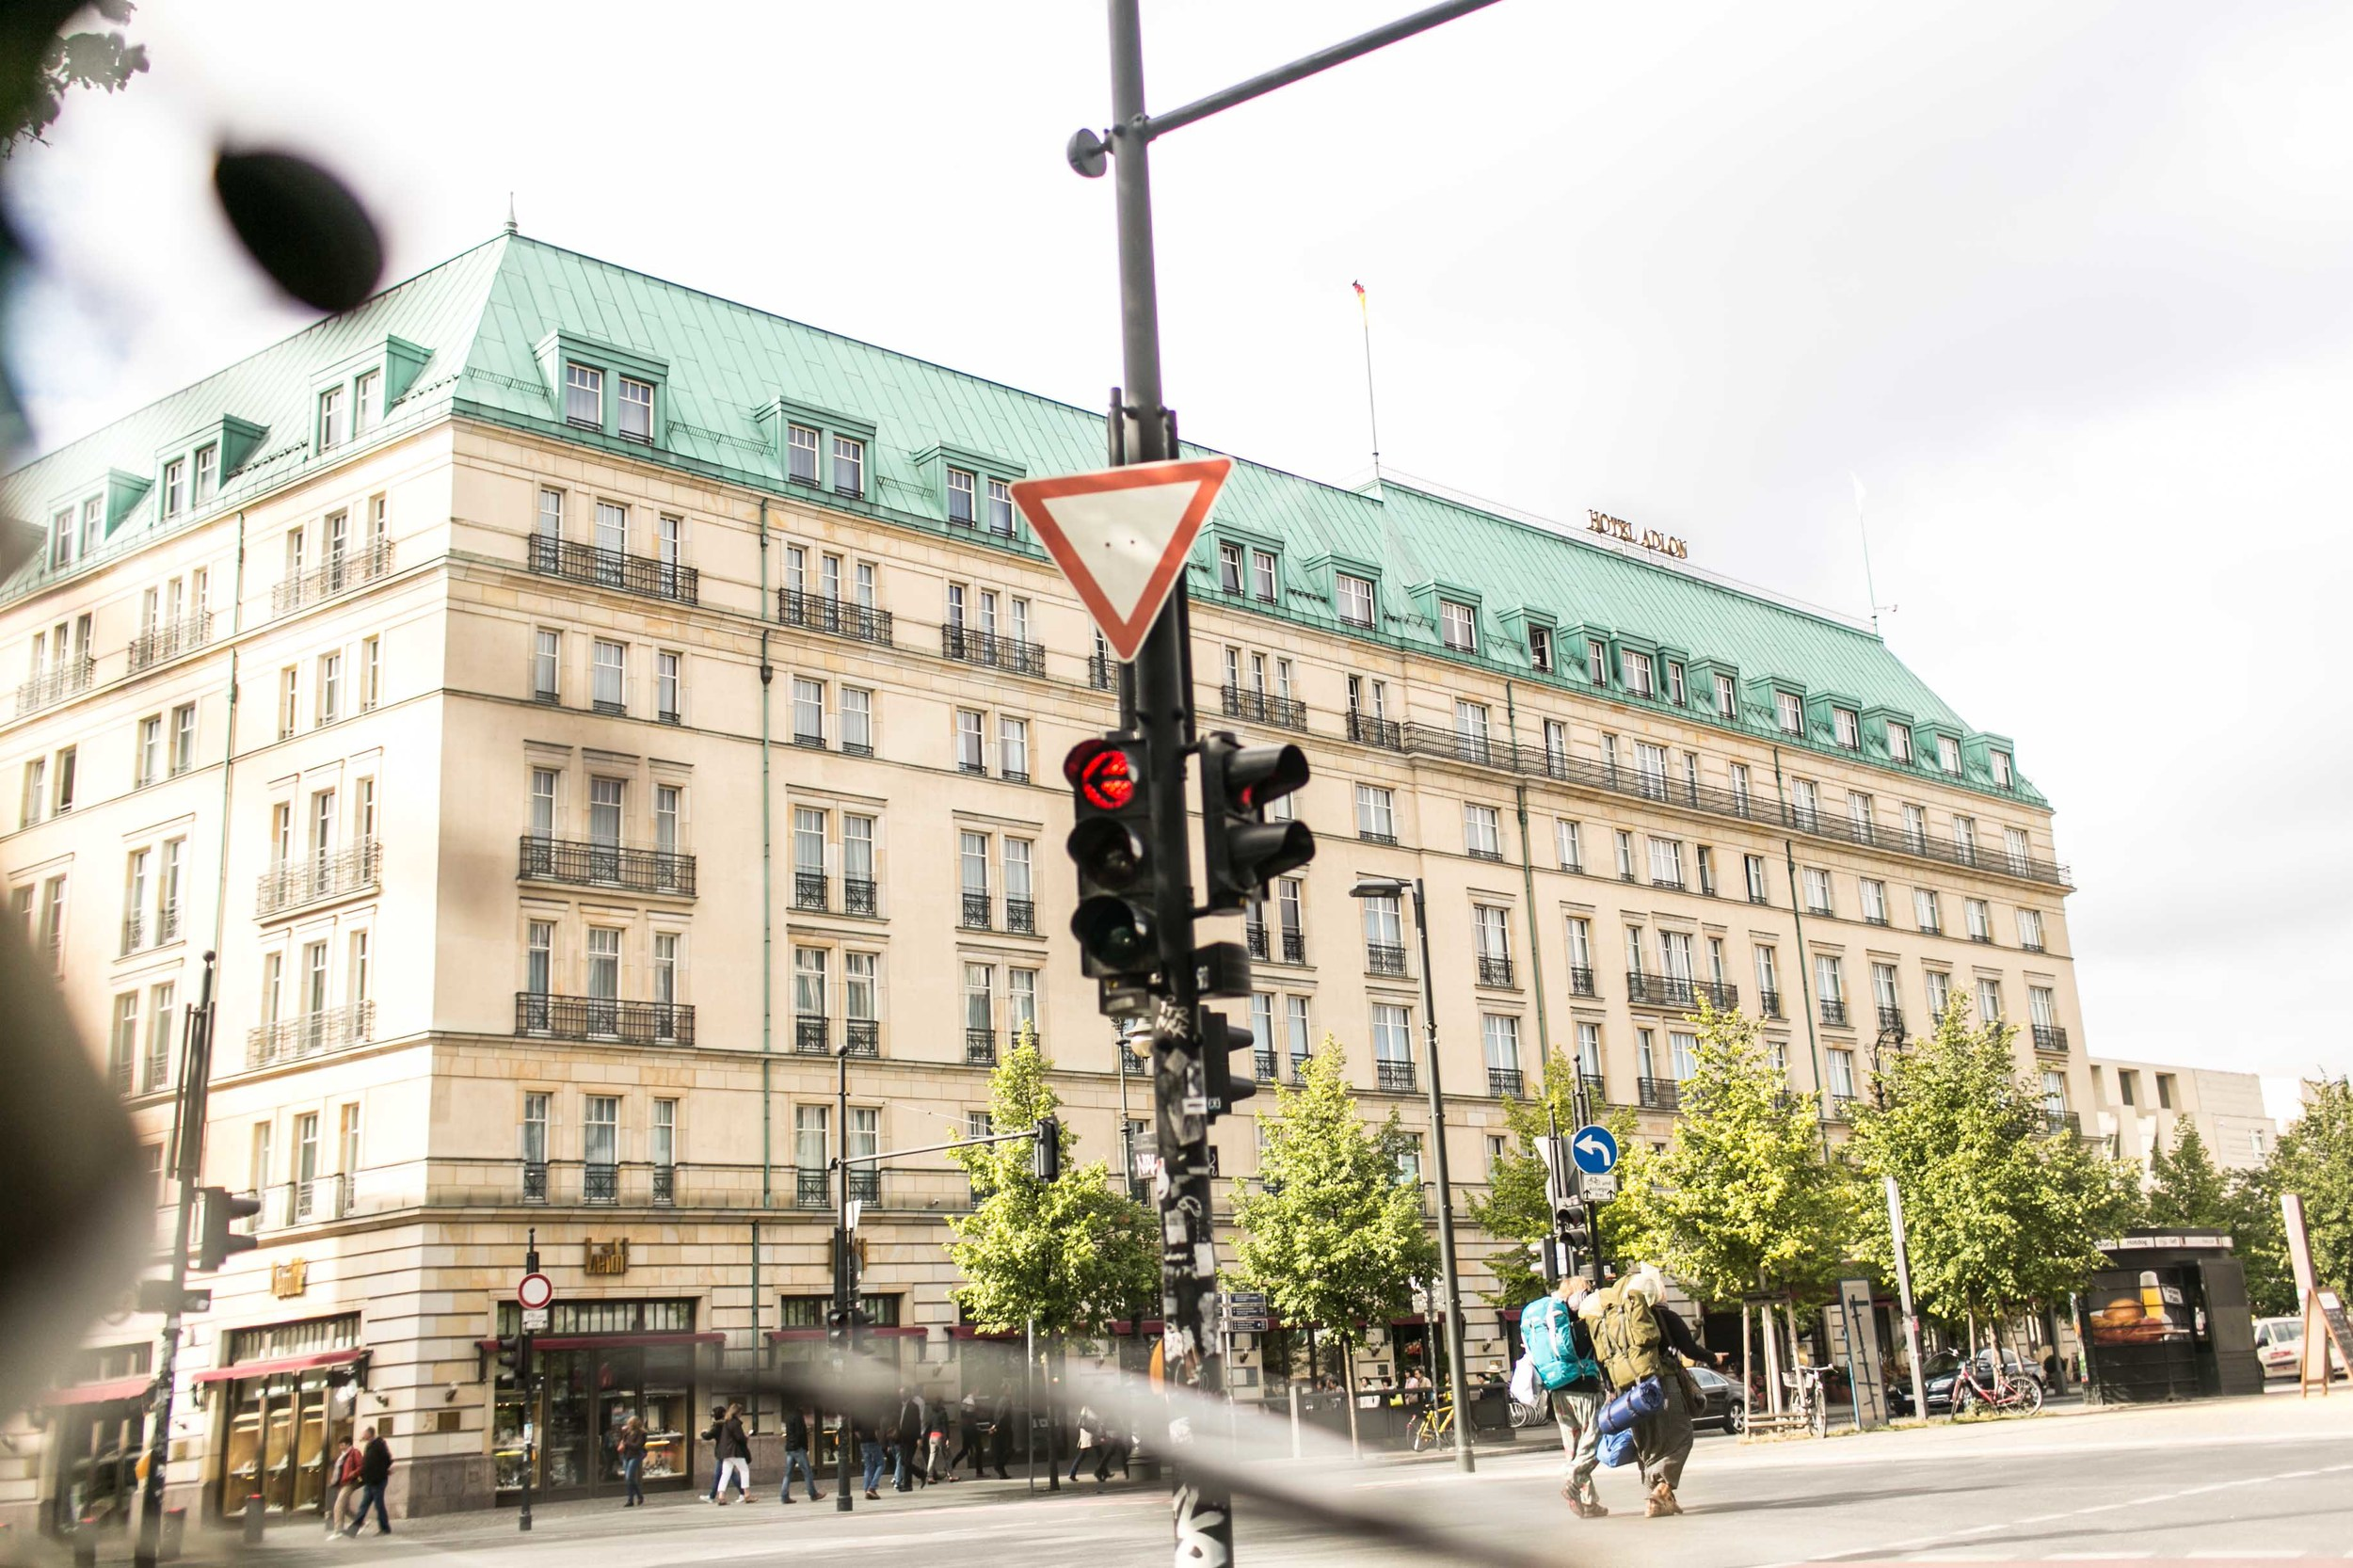 Fran Burrows Hochzeitsfotografie Berlin_Hotel Adlon-34.jpg